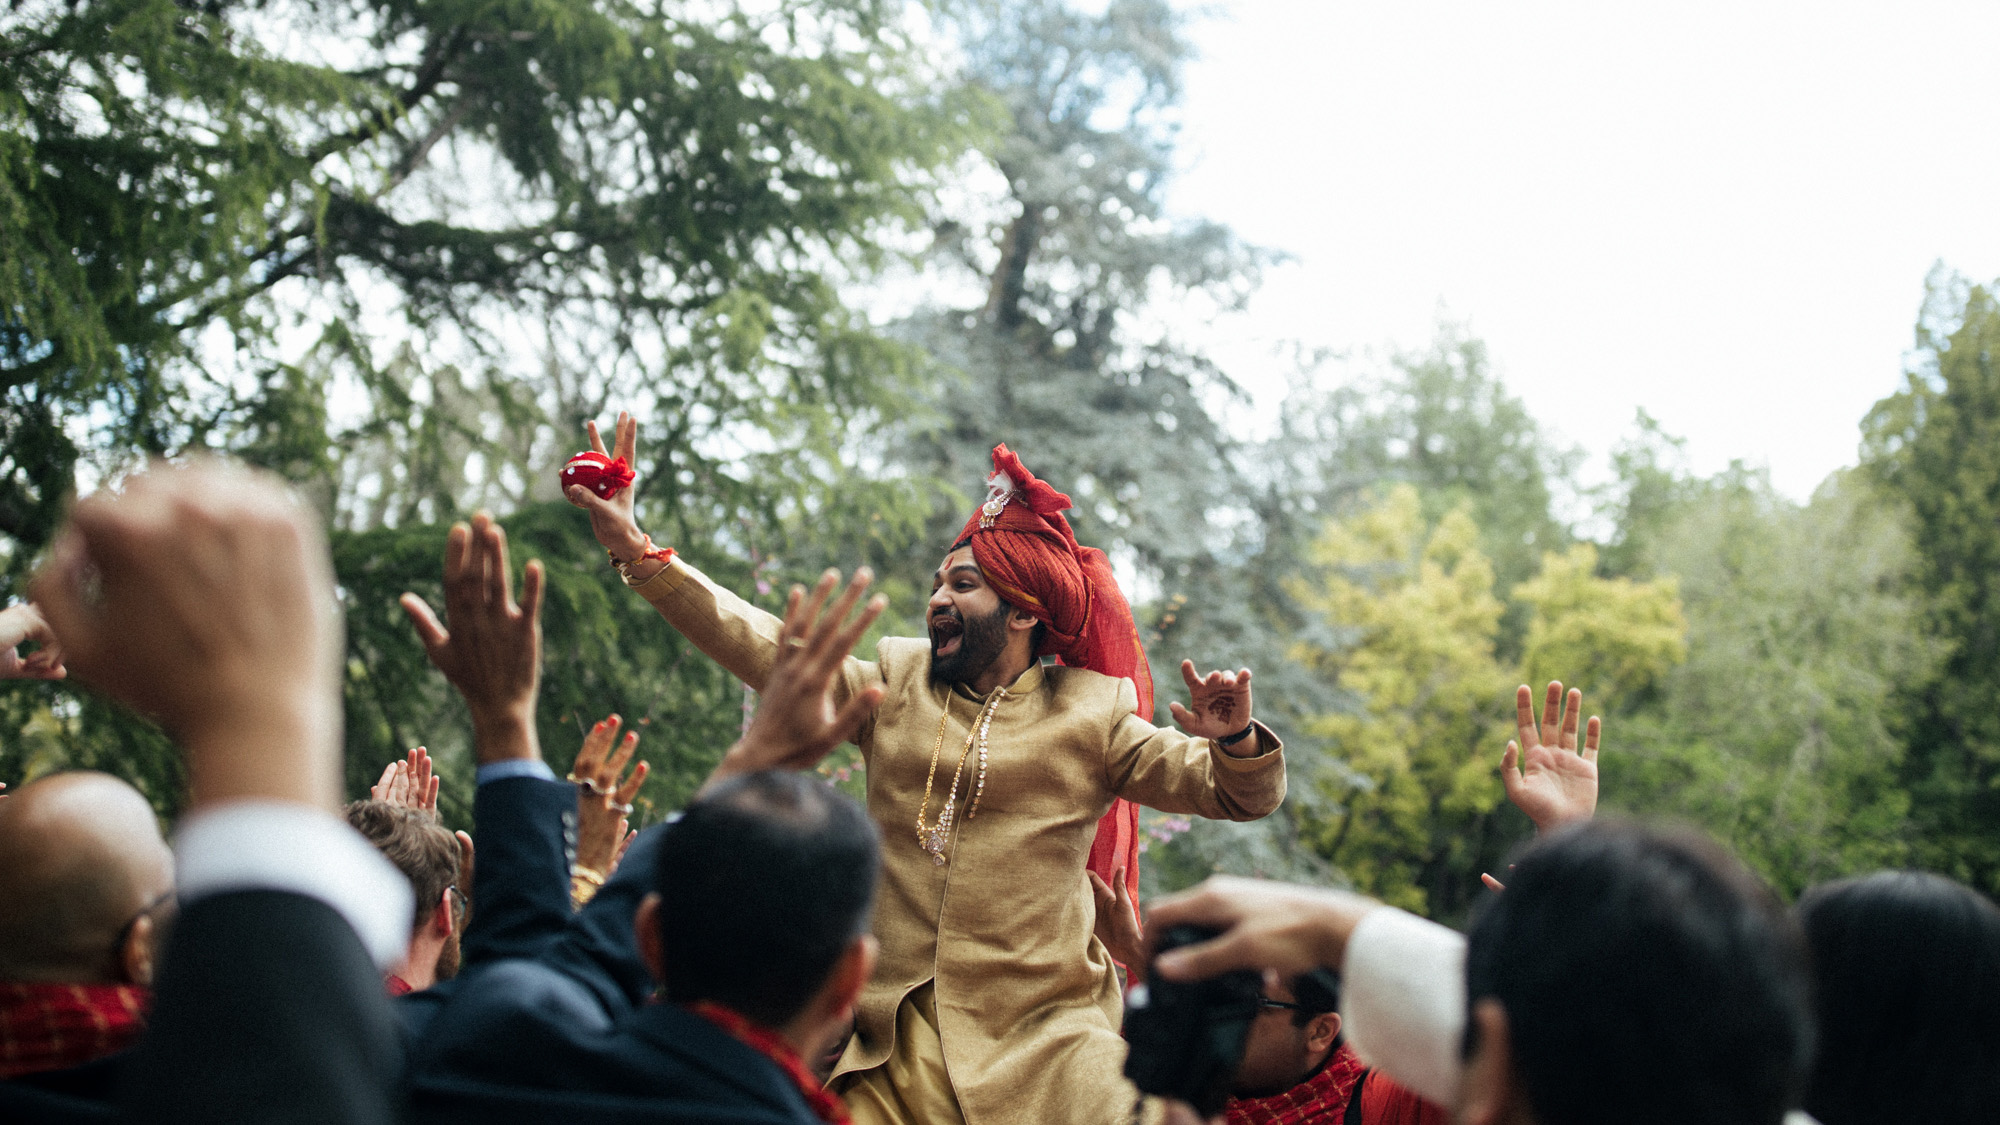 anu_maneesh_alec_vanderboom_Indian_wedding_photography-0076.jpg